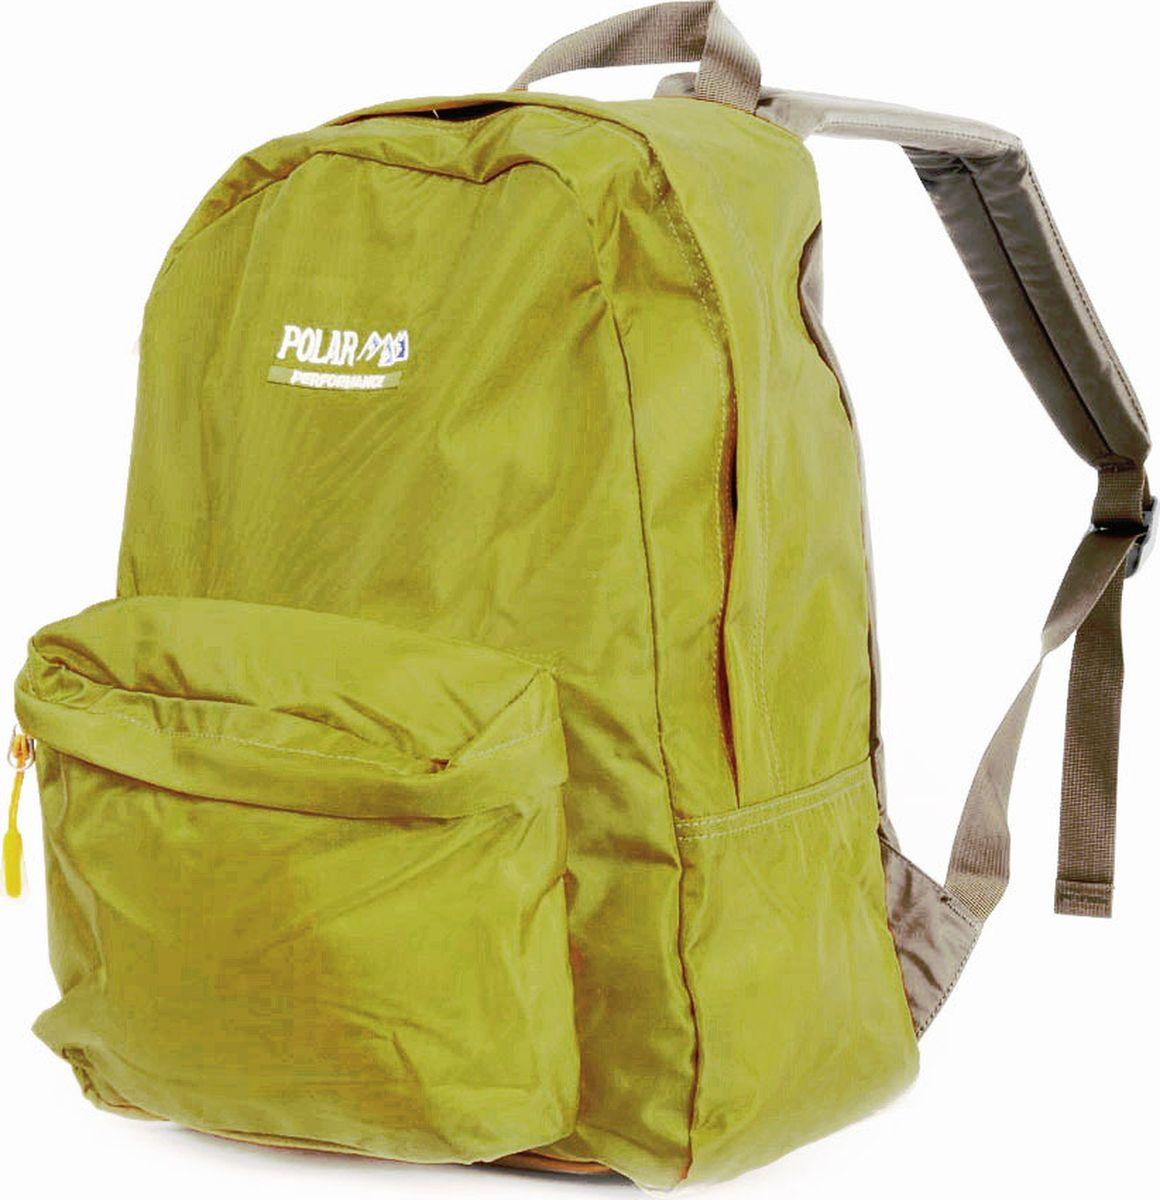 Рюкзак городской Polar, цвет: желтый, 27,5 л. П1611-03 polar po001bkvpd33 polar